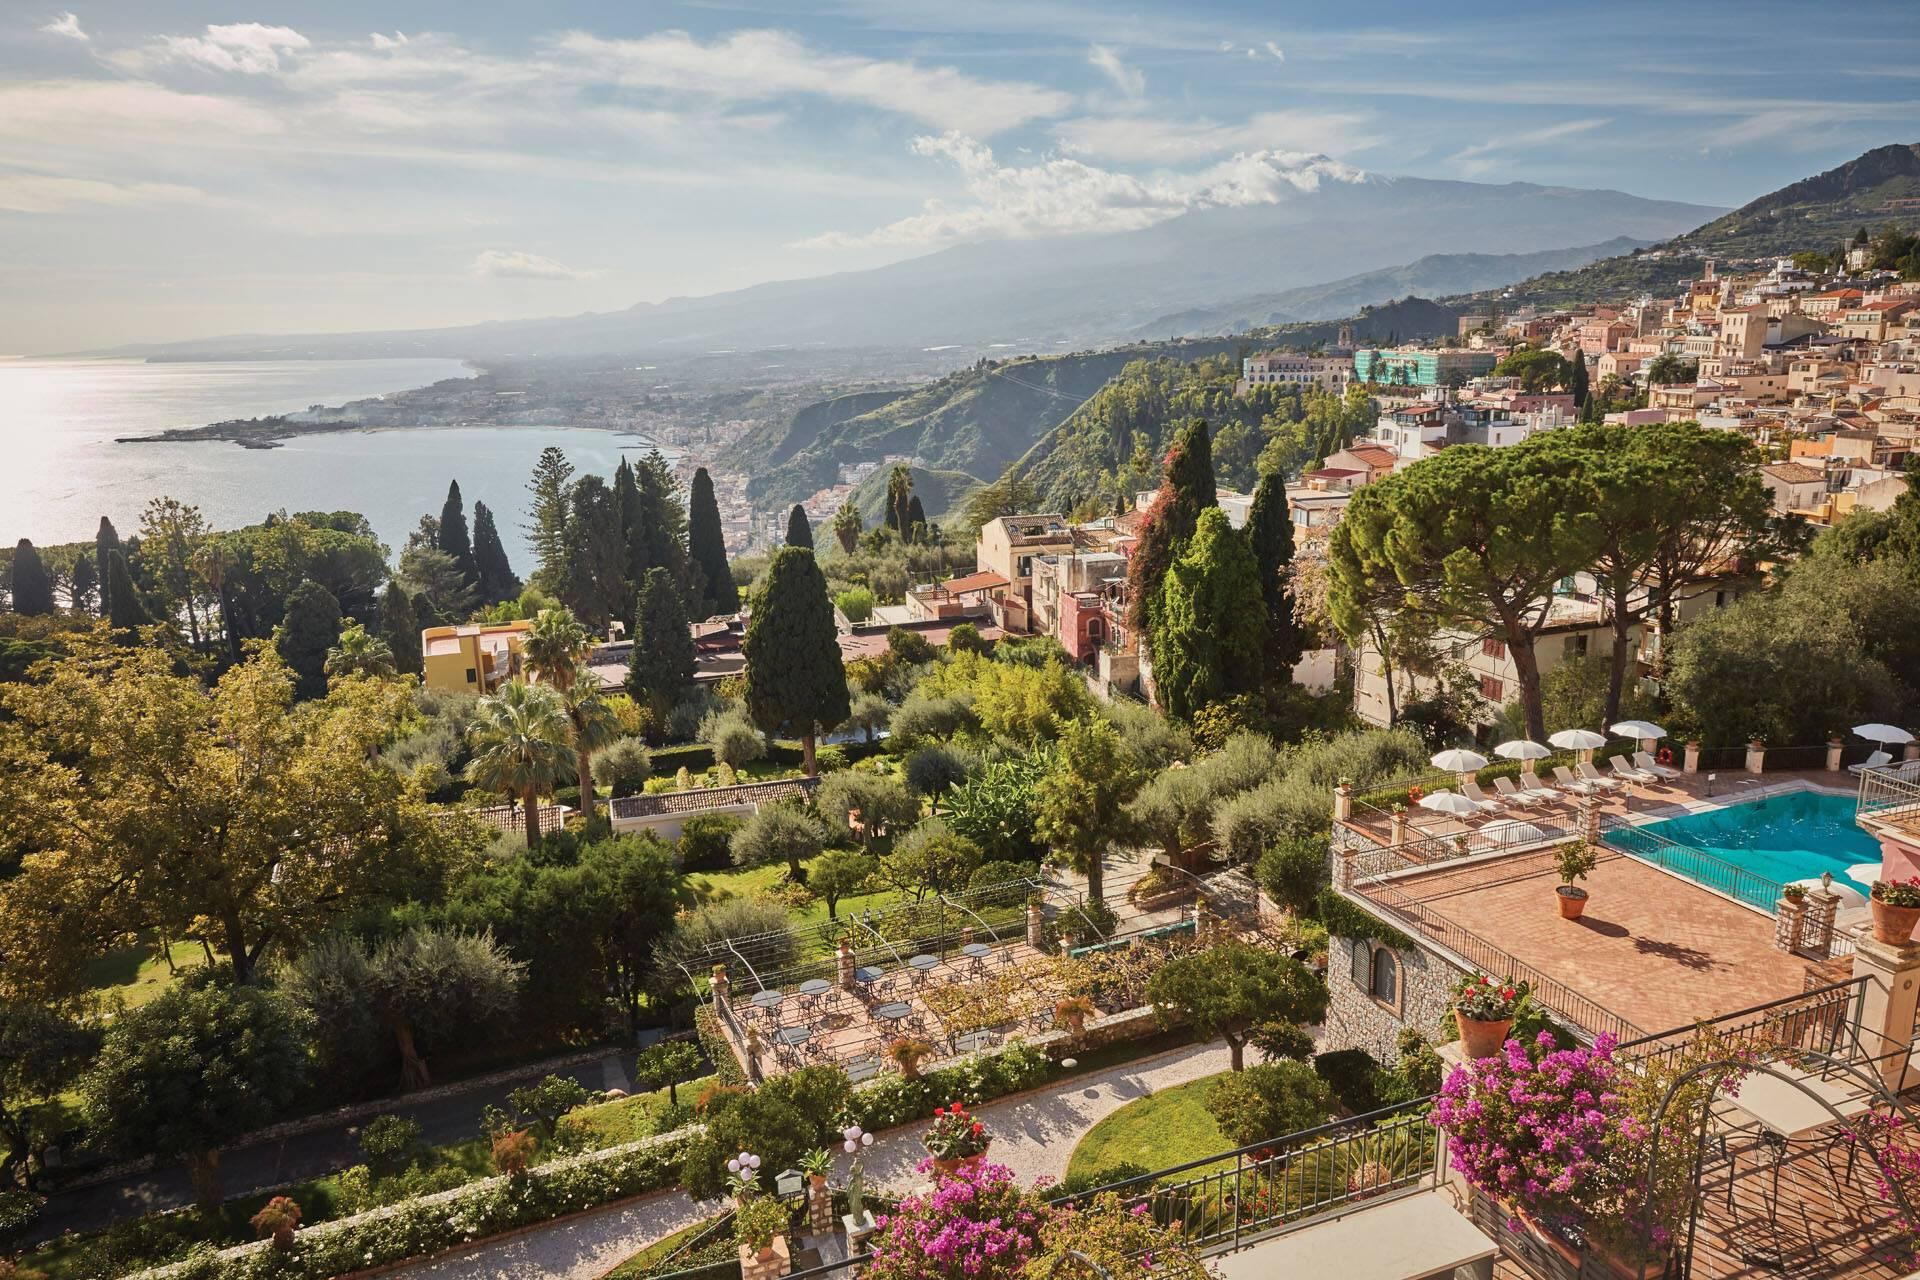 Grand Hotel Timeo Taormine Sicile Vue